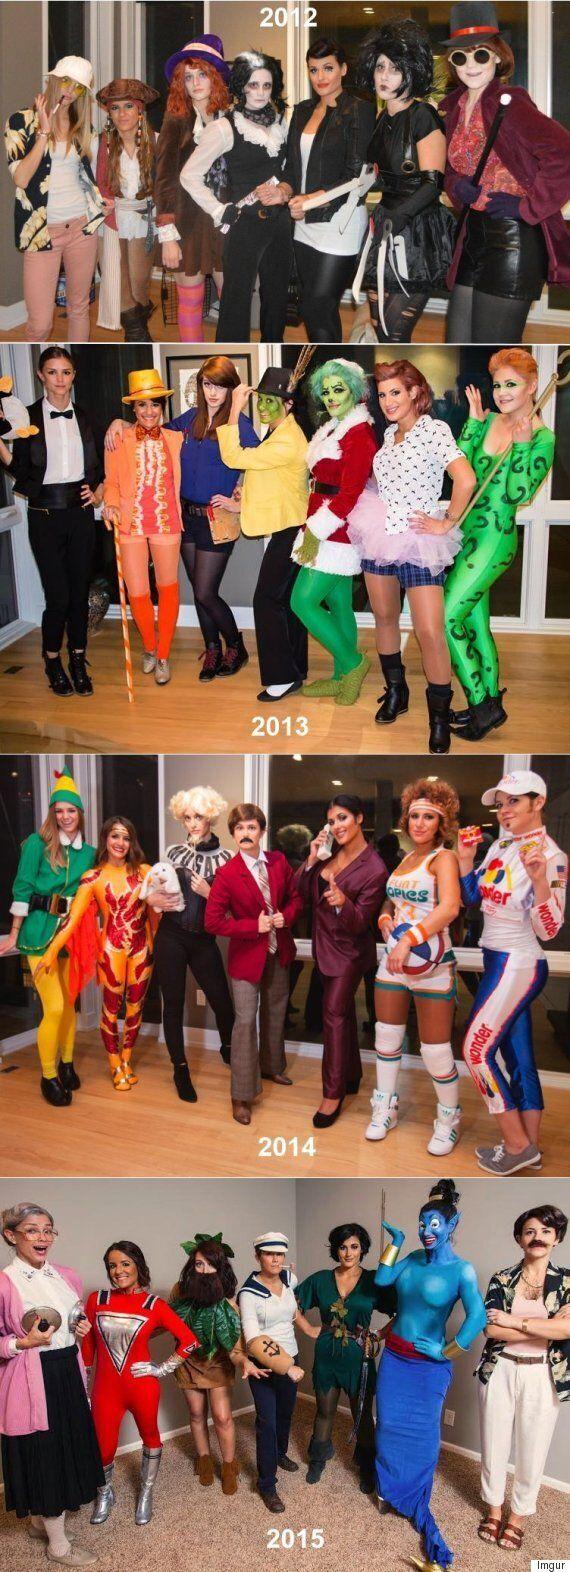 Group Halloween Costume Ideas 7 Women Dress Up As One Actor